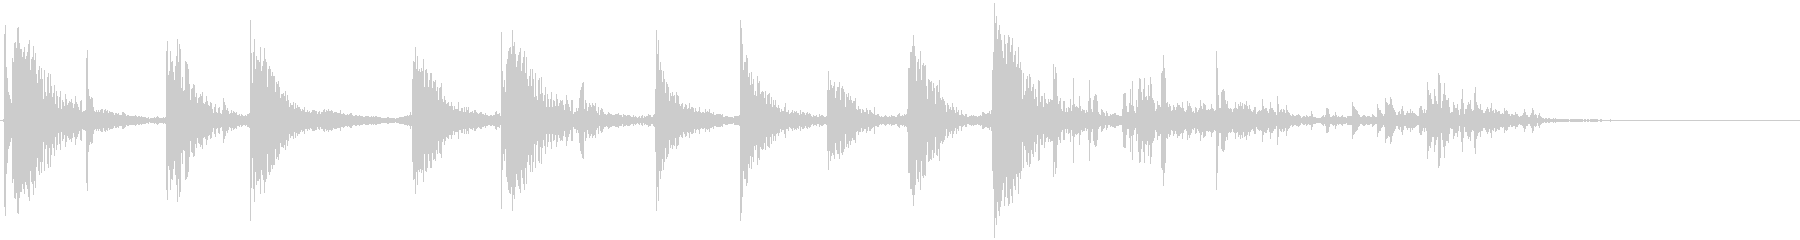 SpecialFx EC09_93_2の未再生の波形